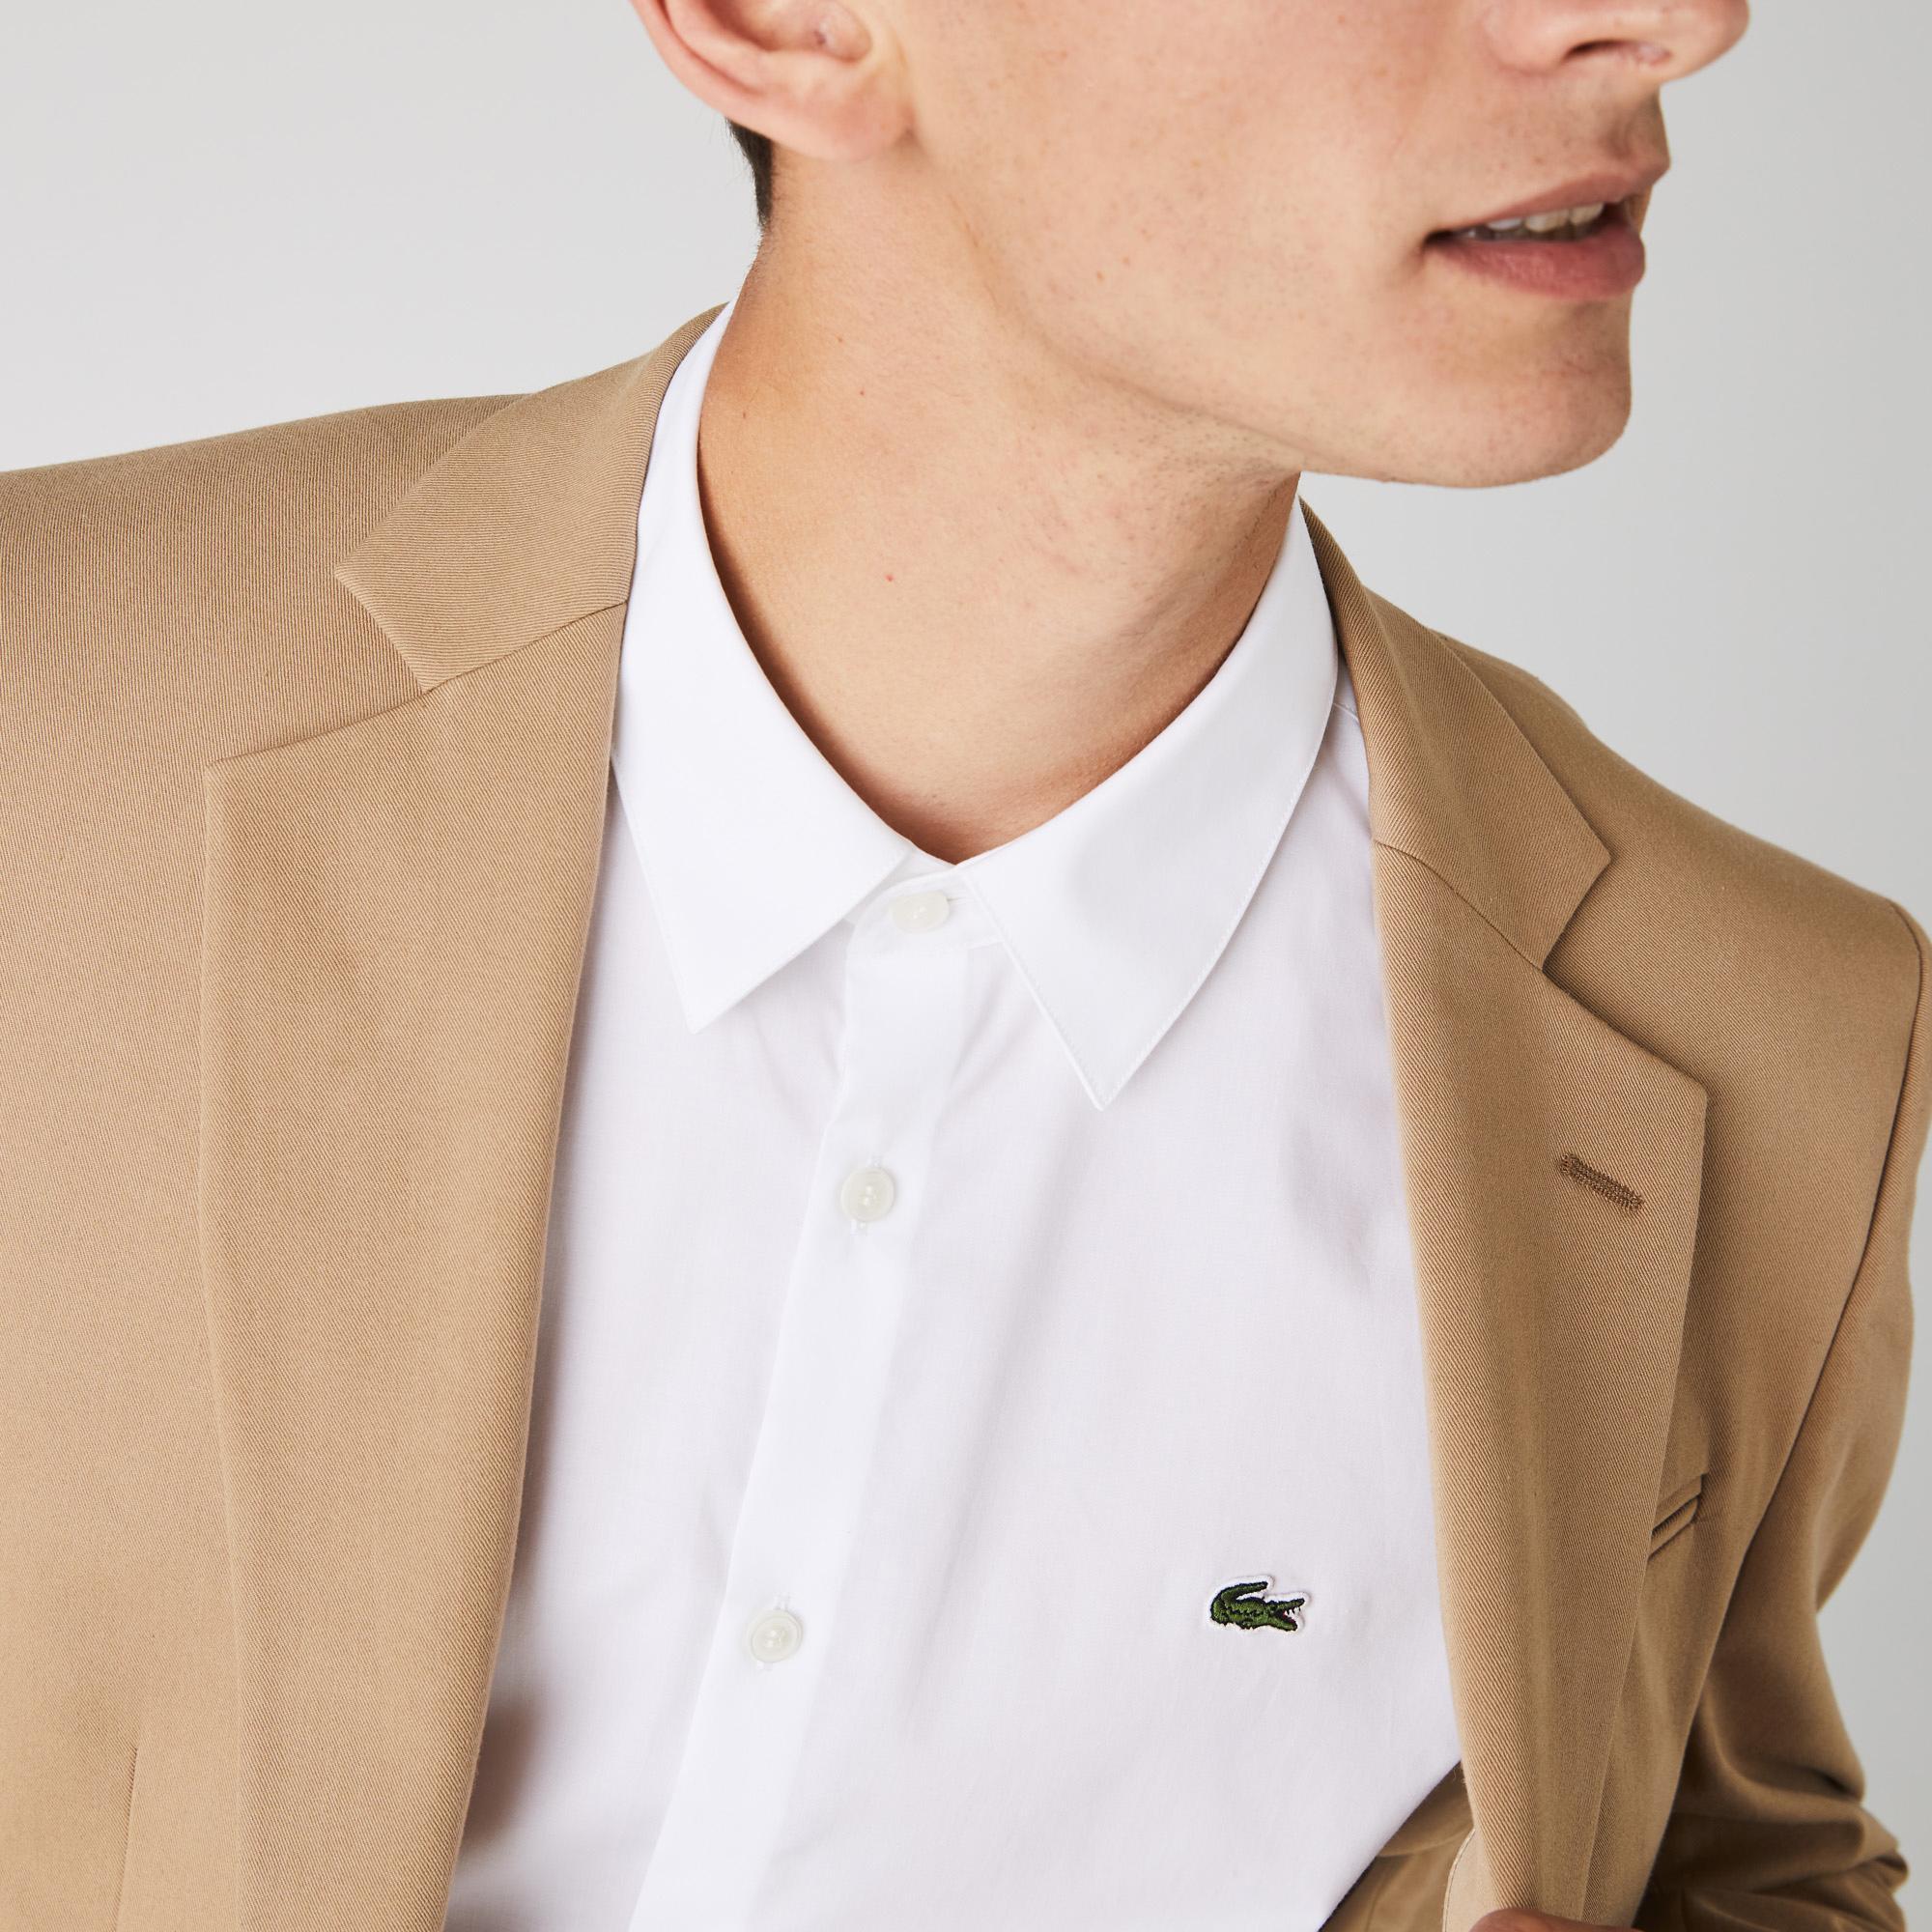 Lacoste Men's Slim Fit Stretch Cotton Poplin Shirt